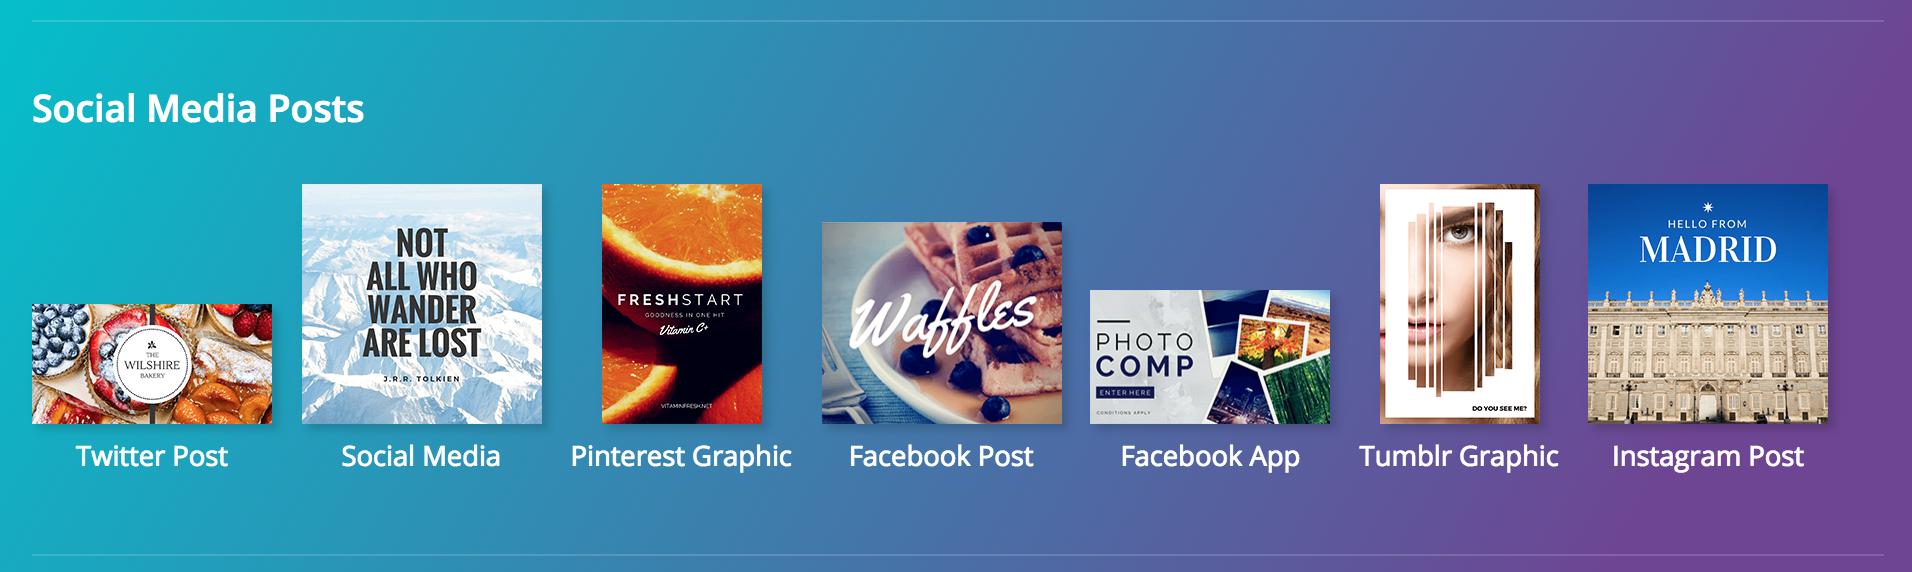 Canva Social Media Templates | YourWriterPlatform.com